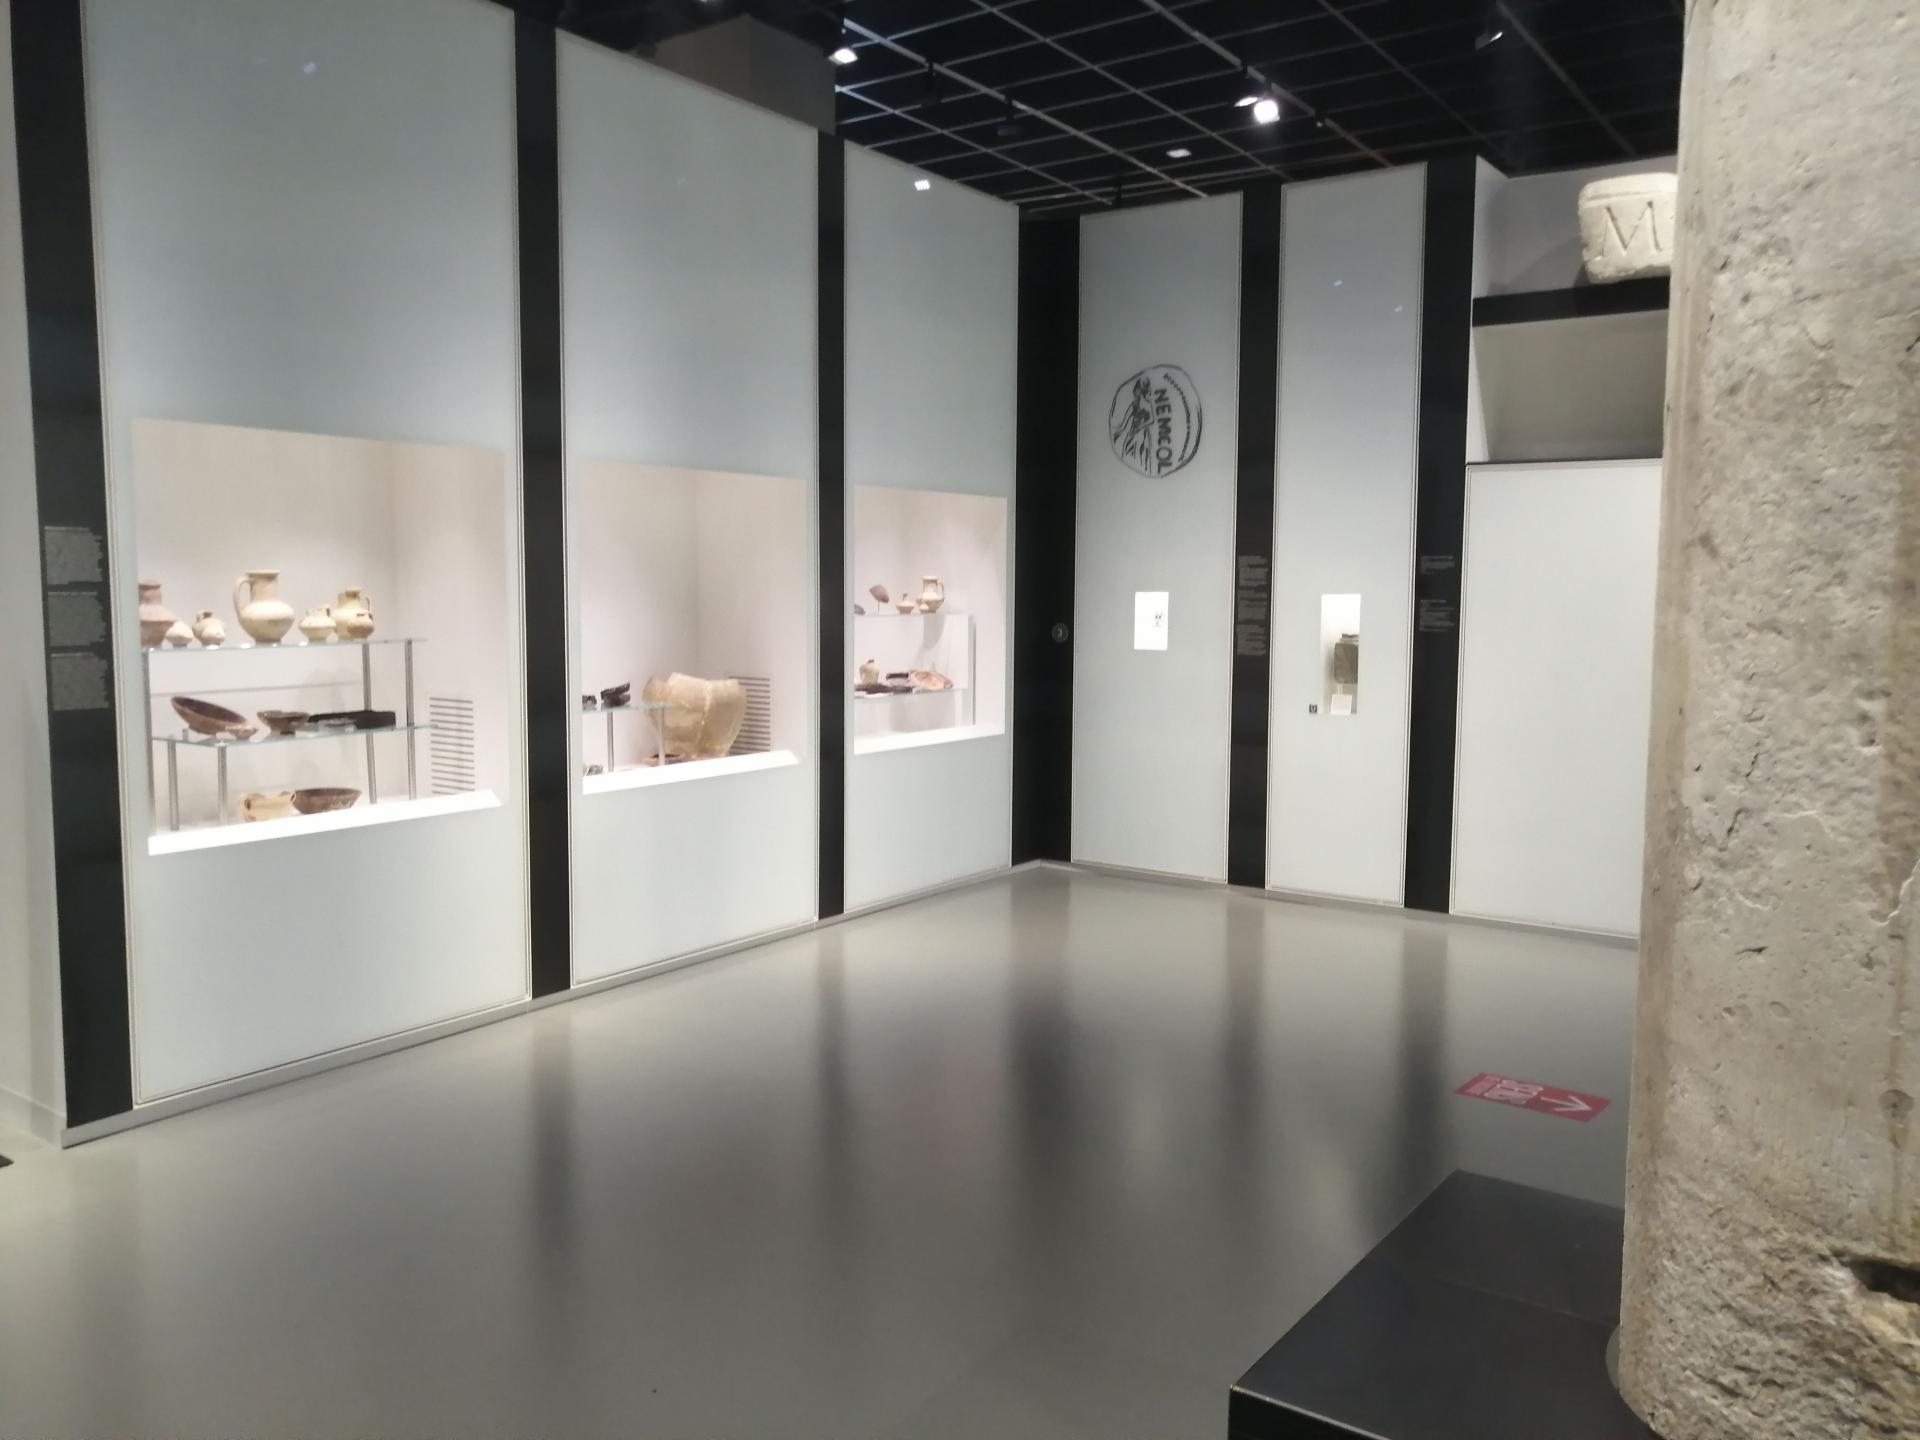 Musee de la romanite 9